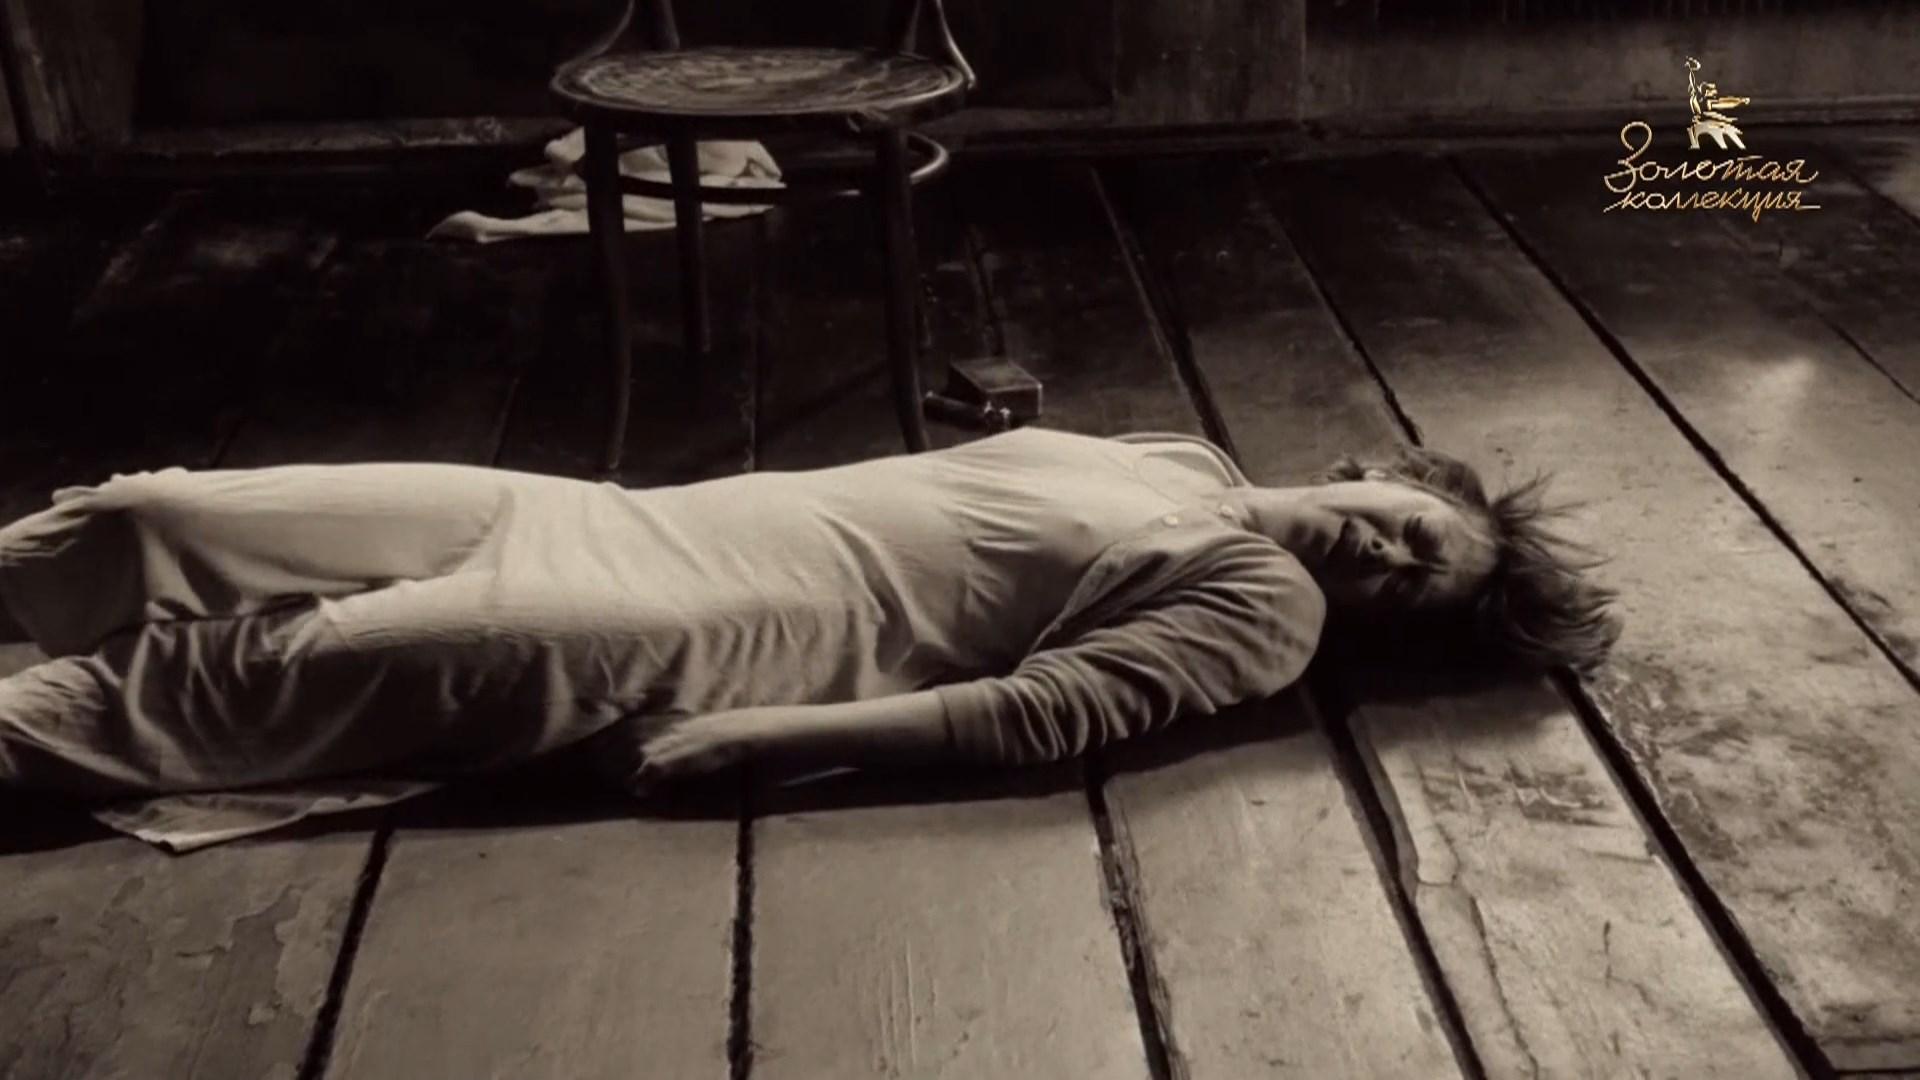 Алиса Фрейндлих. Сталкер (1979).ts_snapshot_00.24.476.jpg